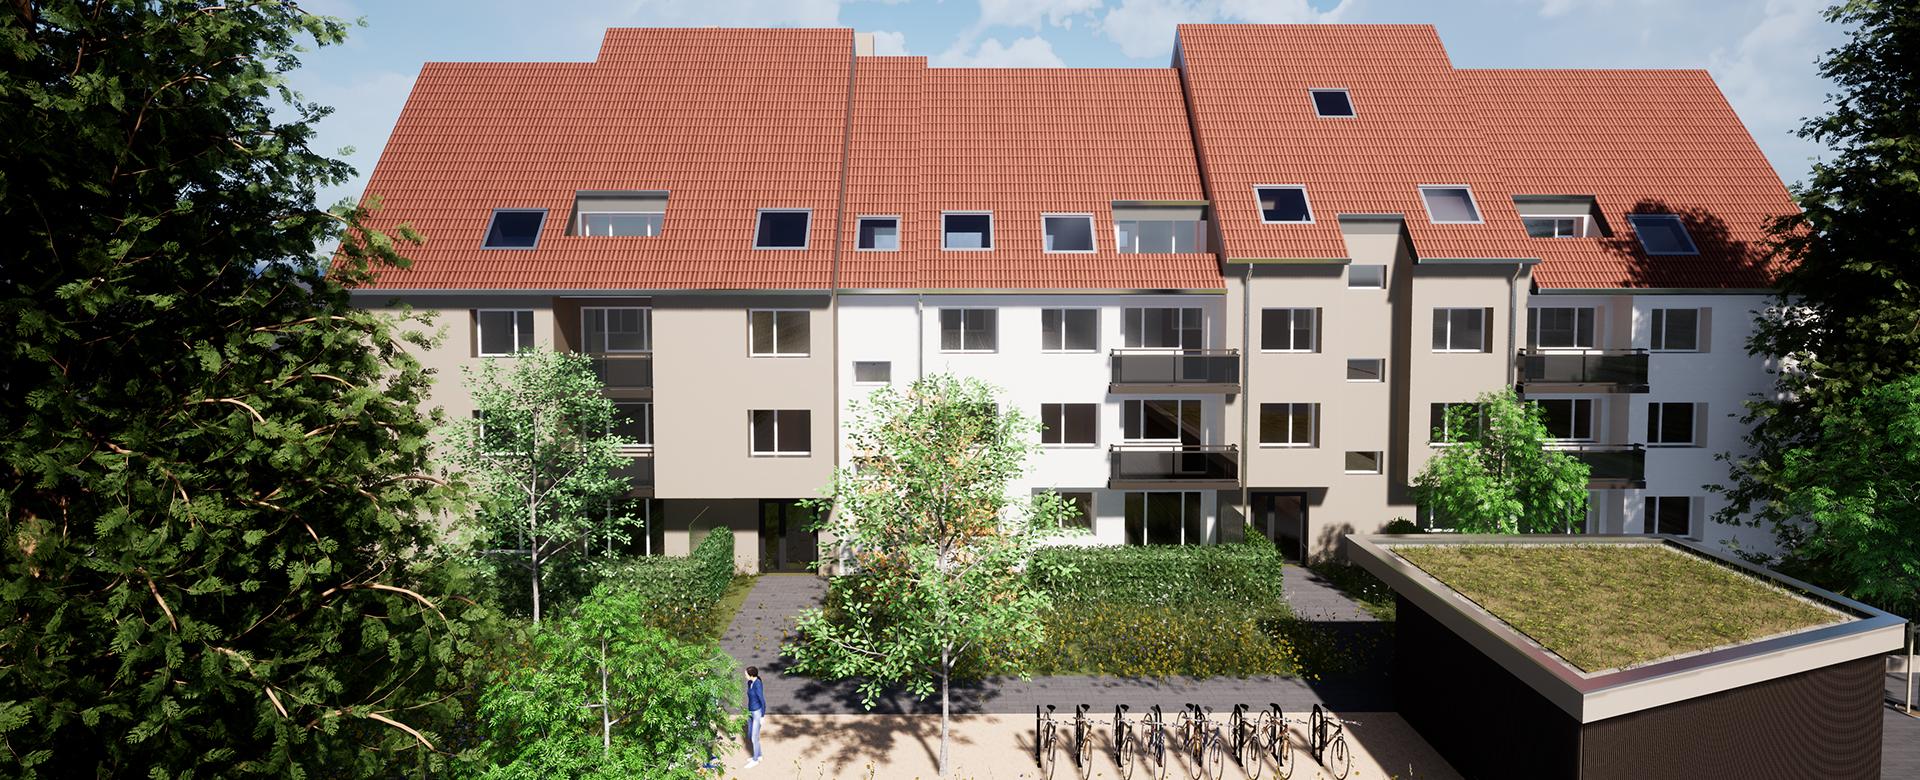 renovation energetique de 150 logements repartis en 6 residences vilogia